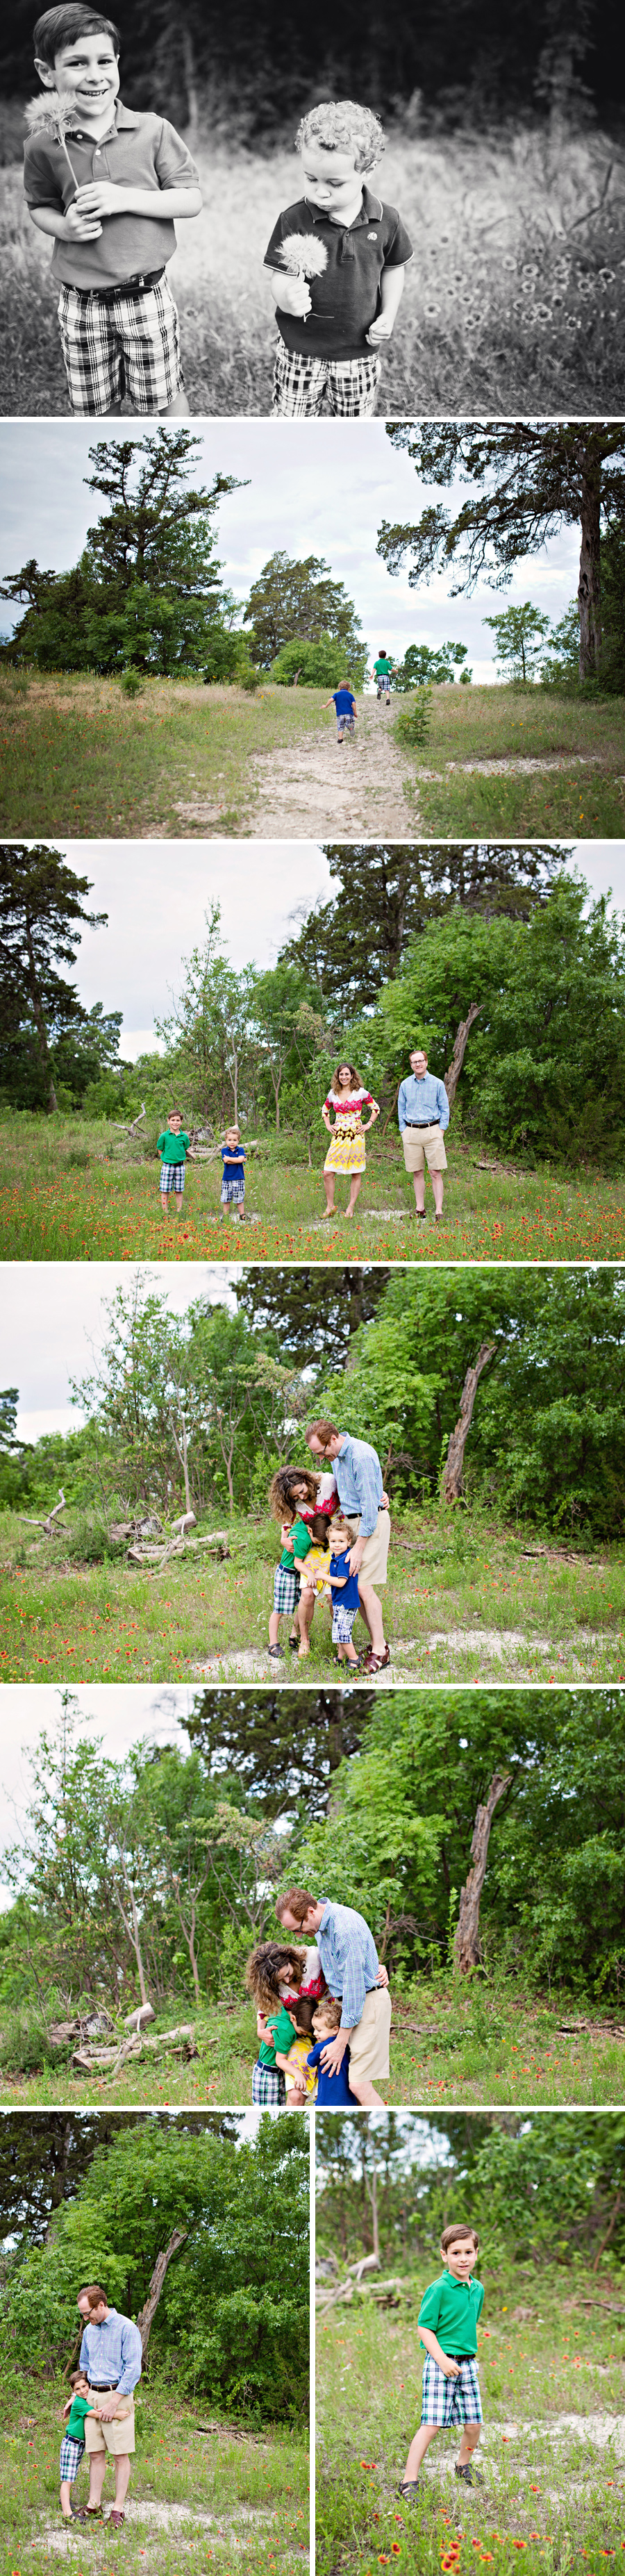 Dallas-Family-Photographer001